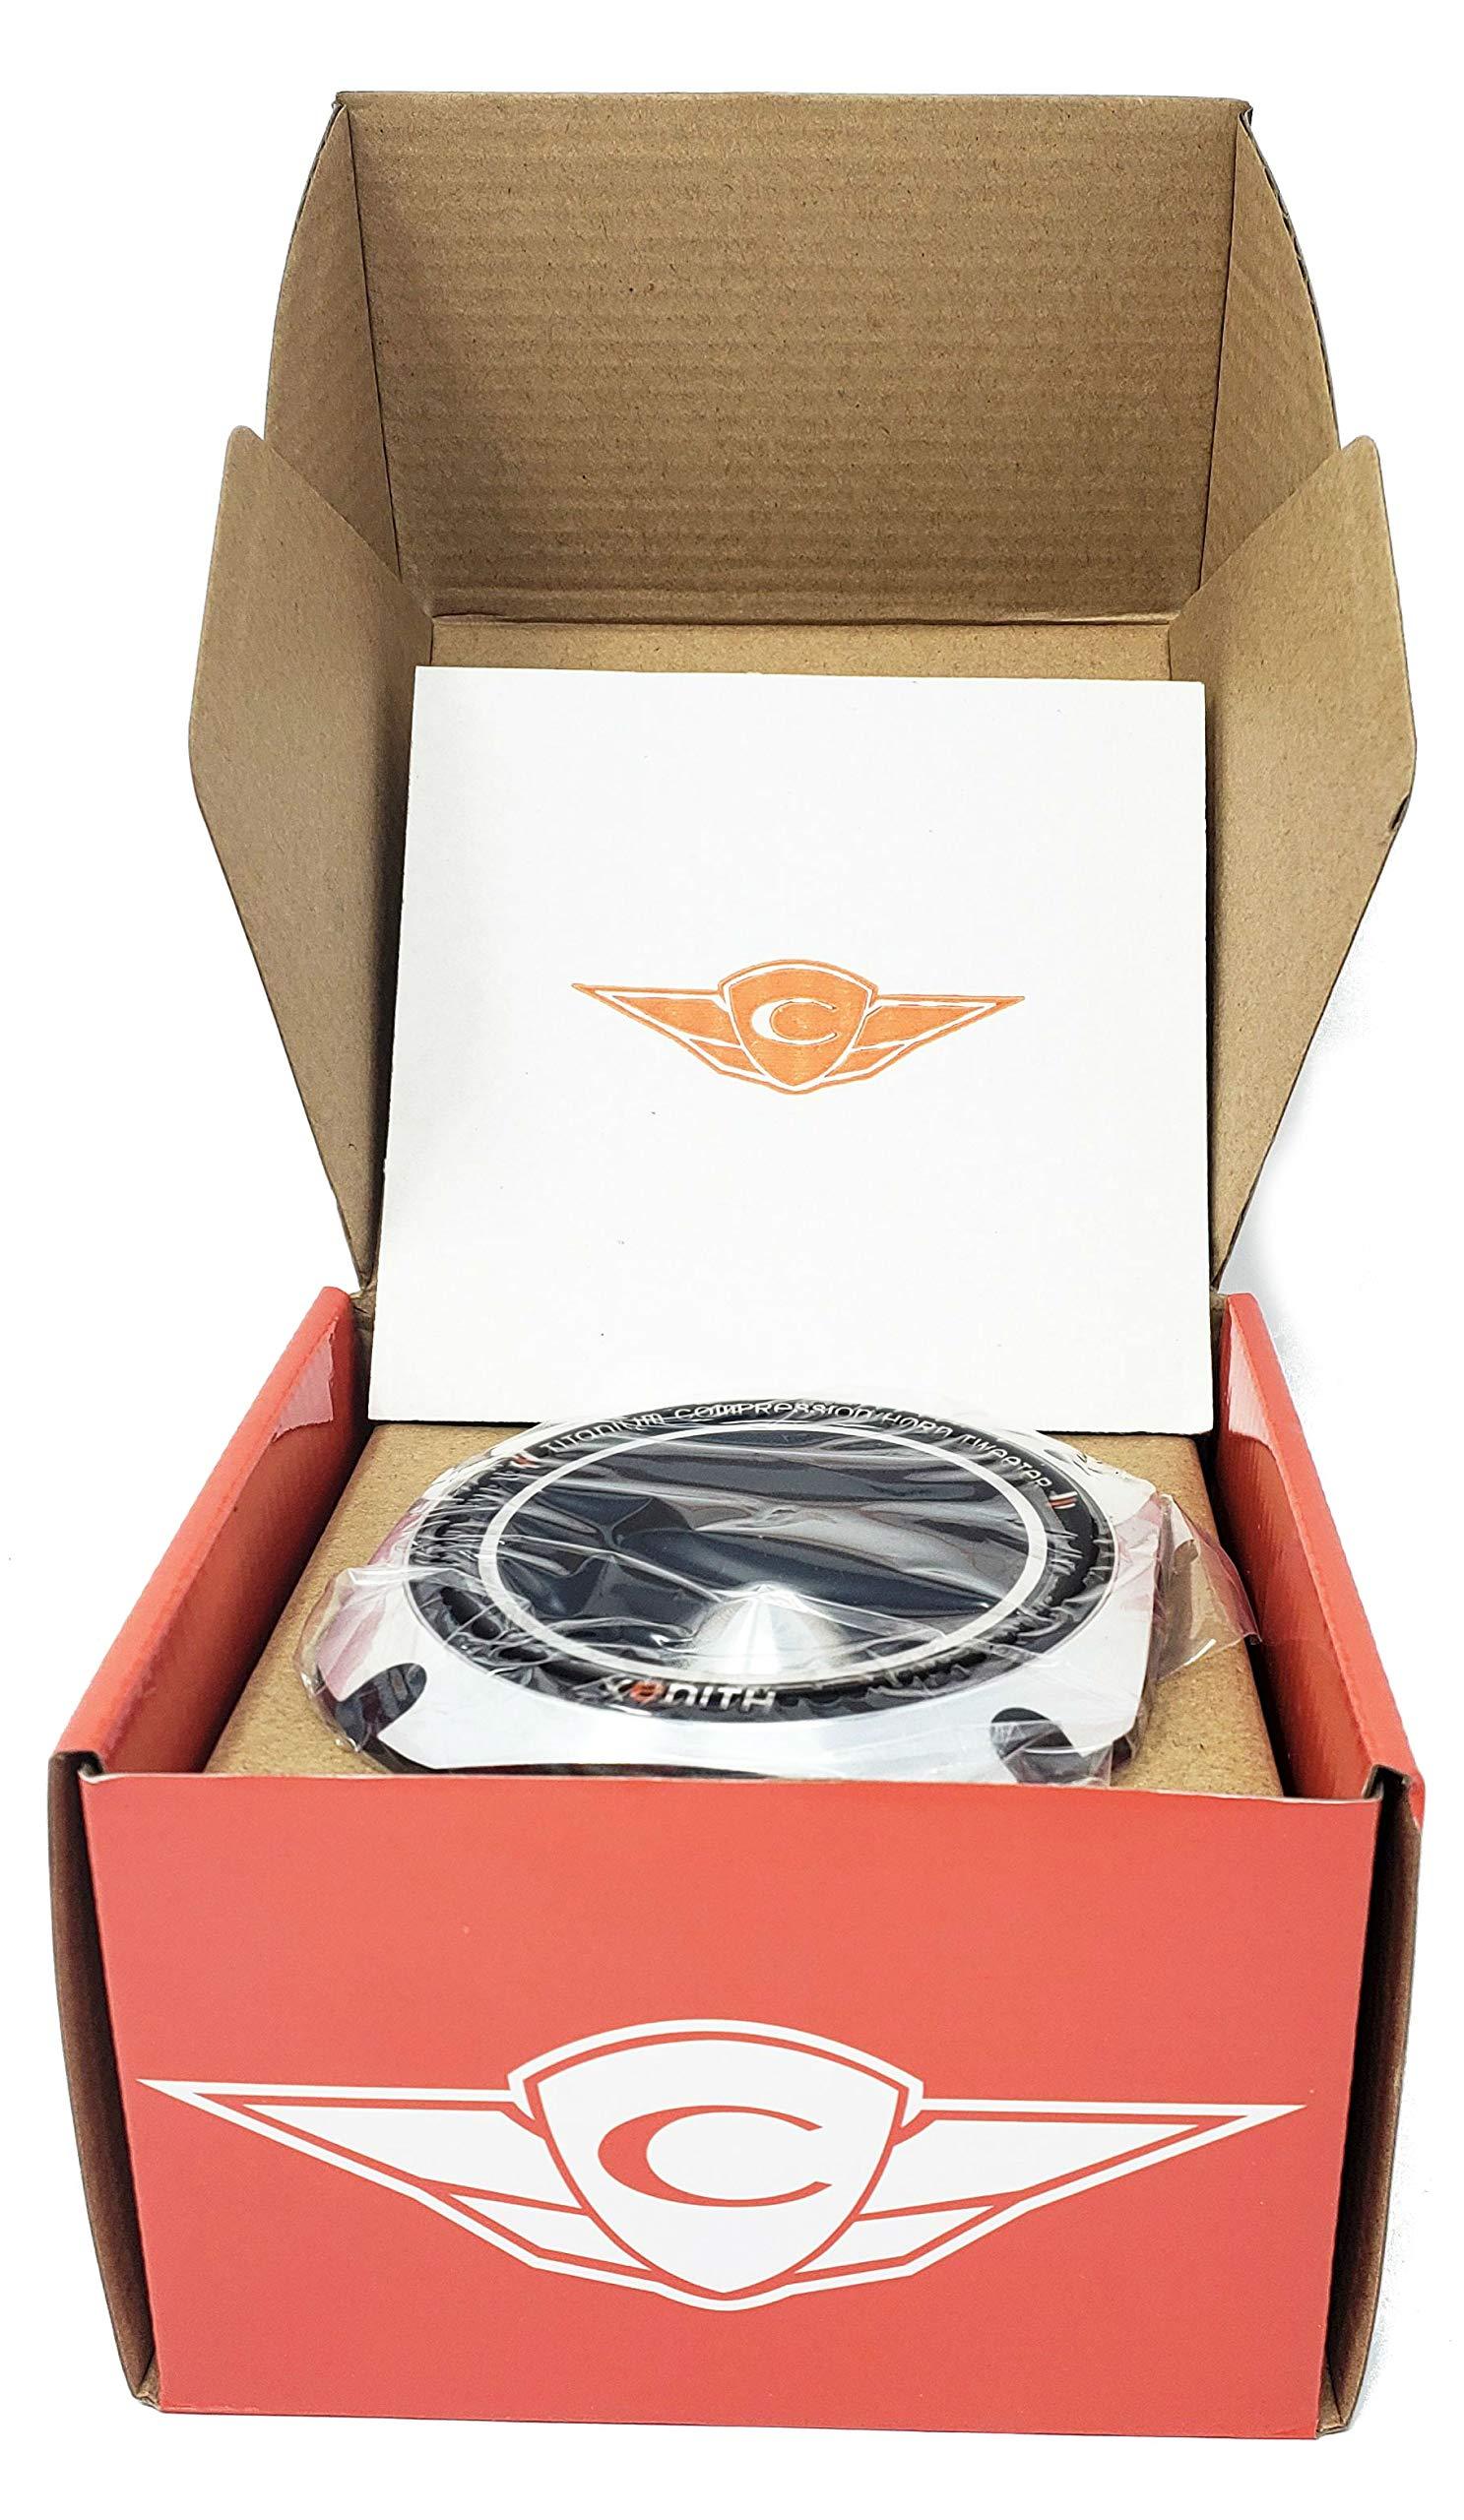 Cadence XT20 300 Watt 2-Inch 8 Ohm Titanium Super Bullet Horn Tweeter 1 Pair